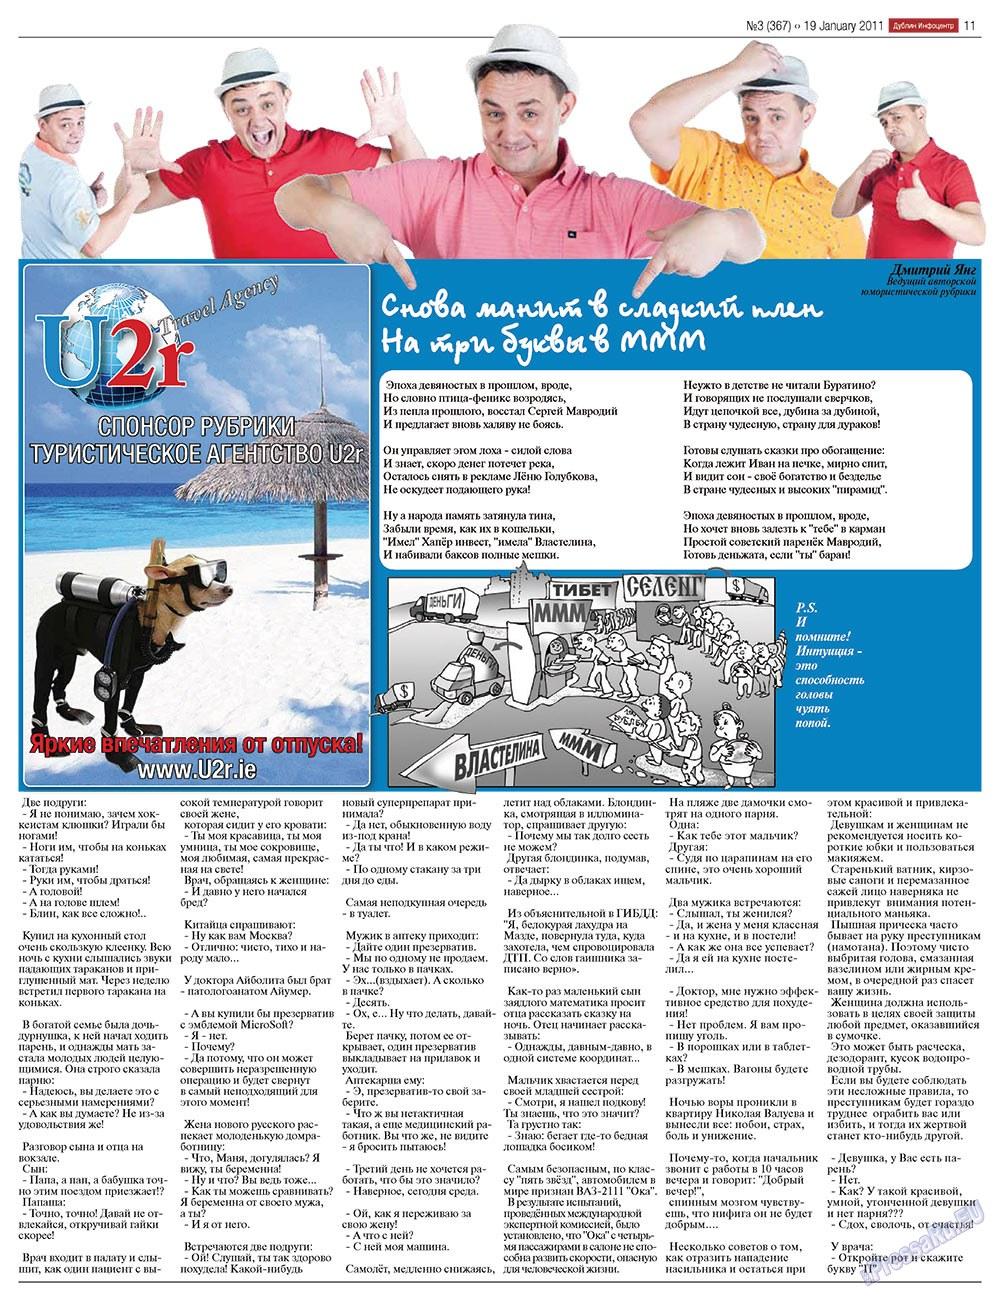 Дублин инфоцентр (газета). 2011 год, номер 3, стр. 11